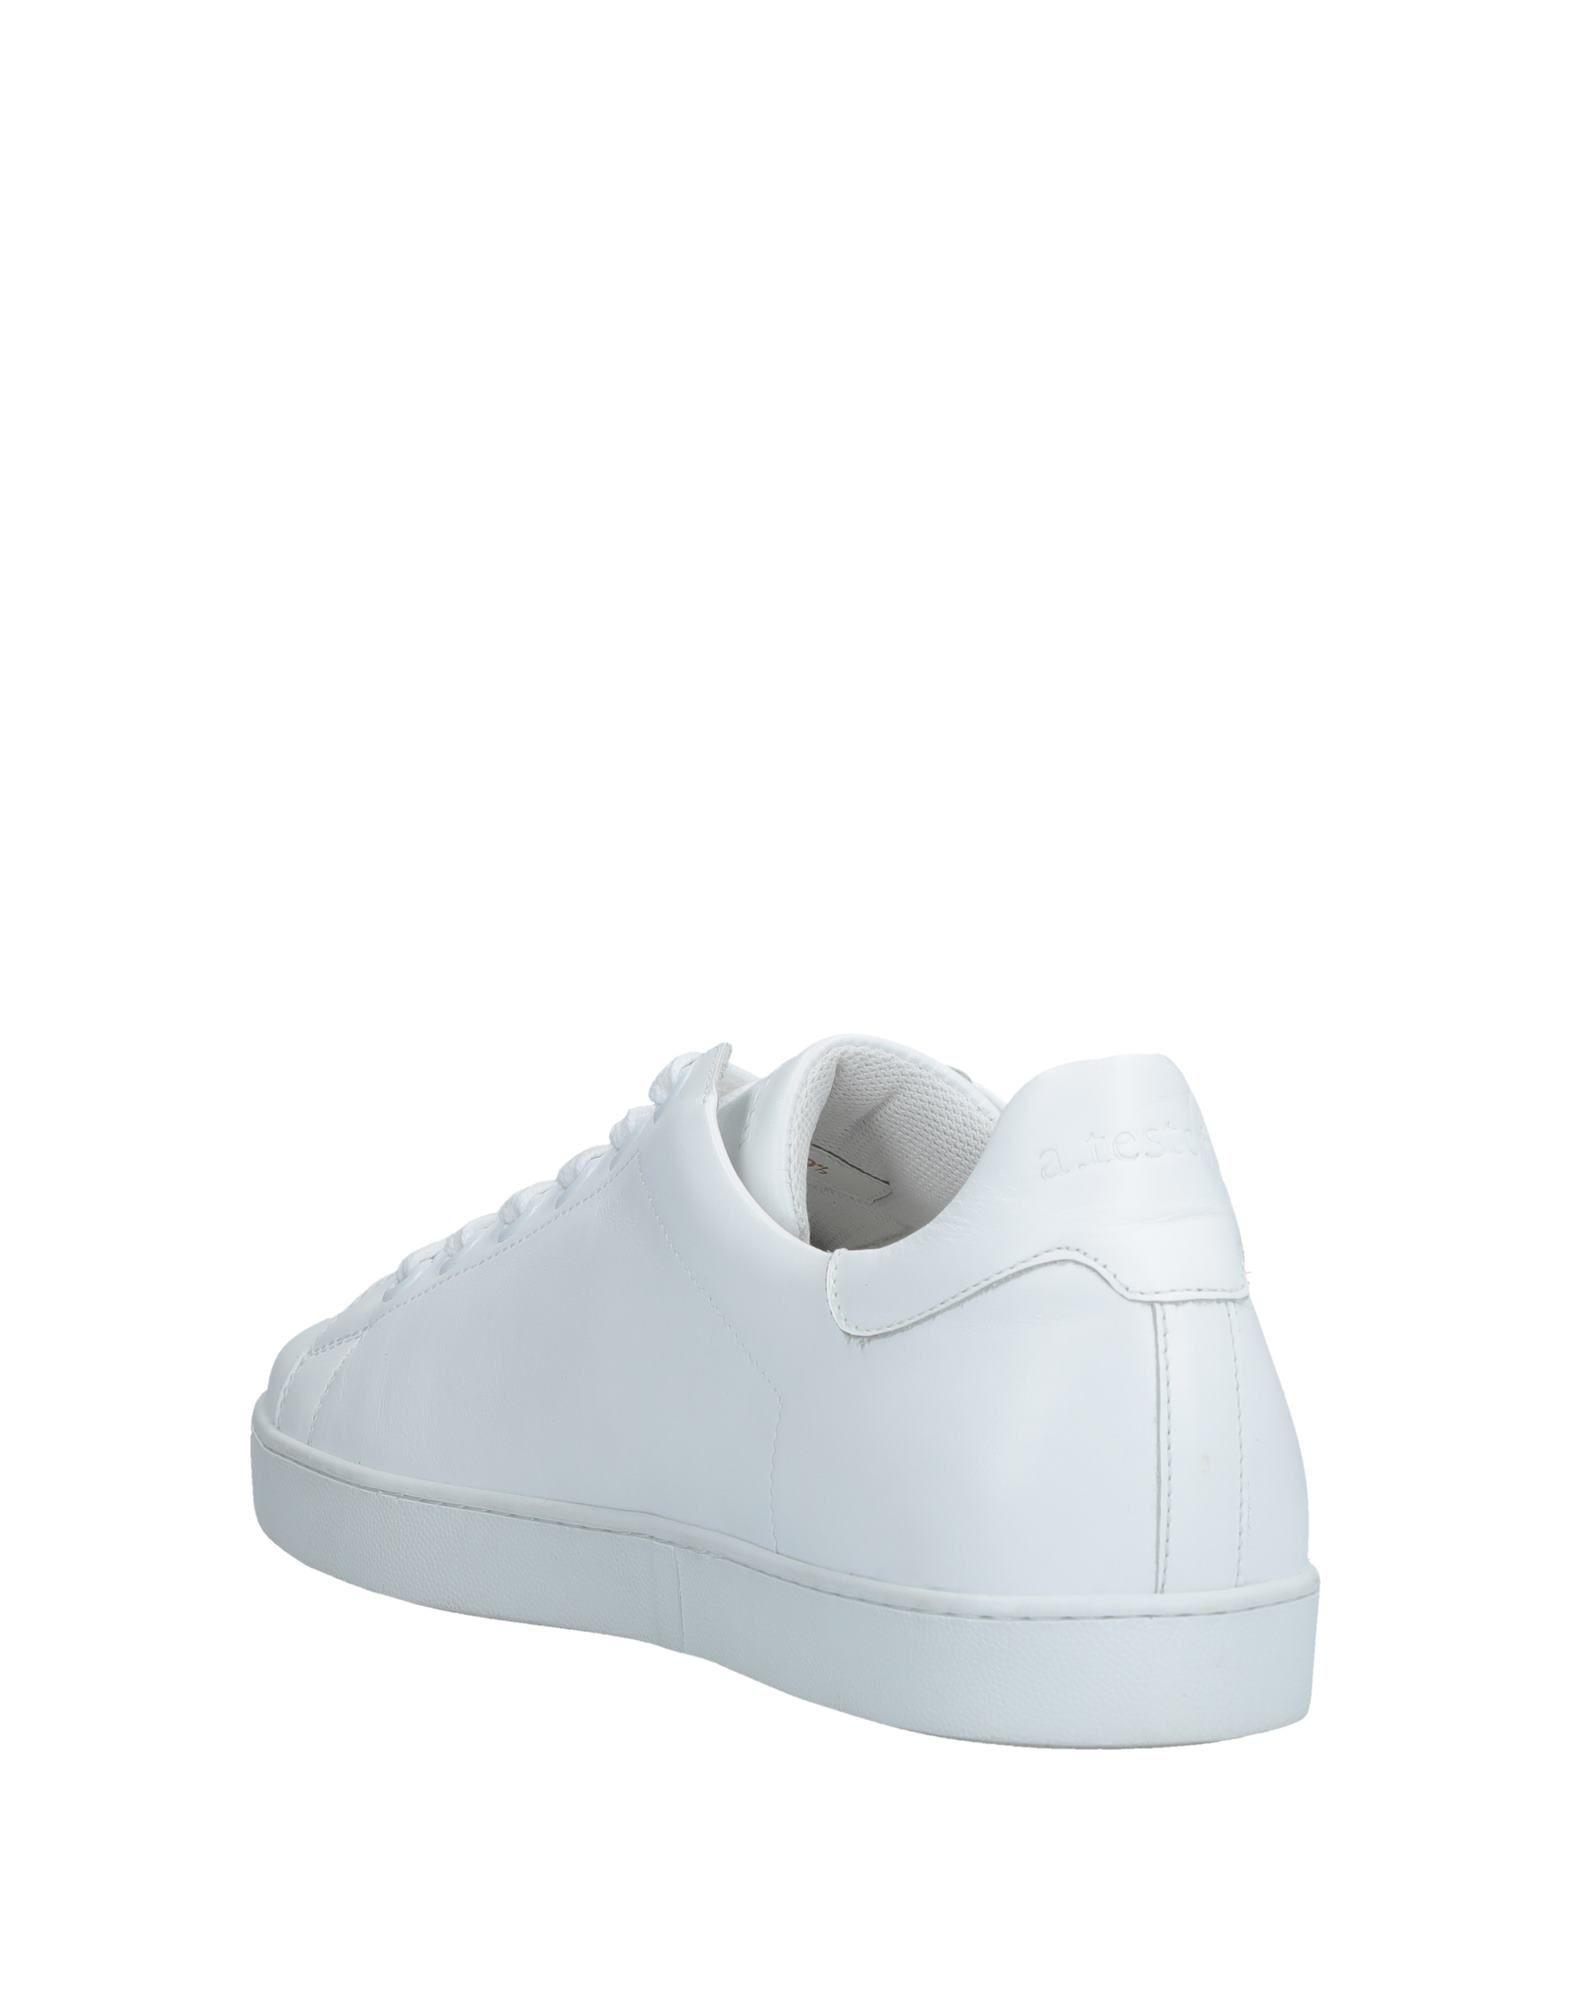 A.Testoni Gute Sneakers Herren  11543011TR Gute A.Testoni Qualität beliebte Schuhe 7b61e2